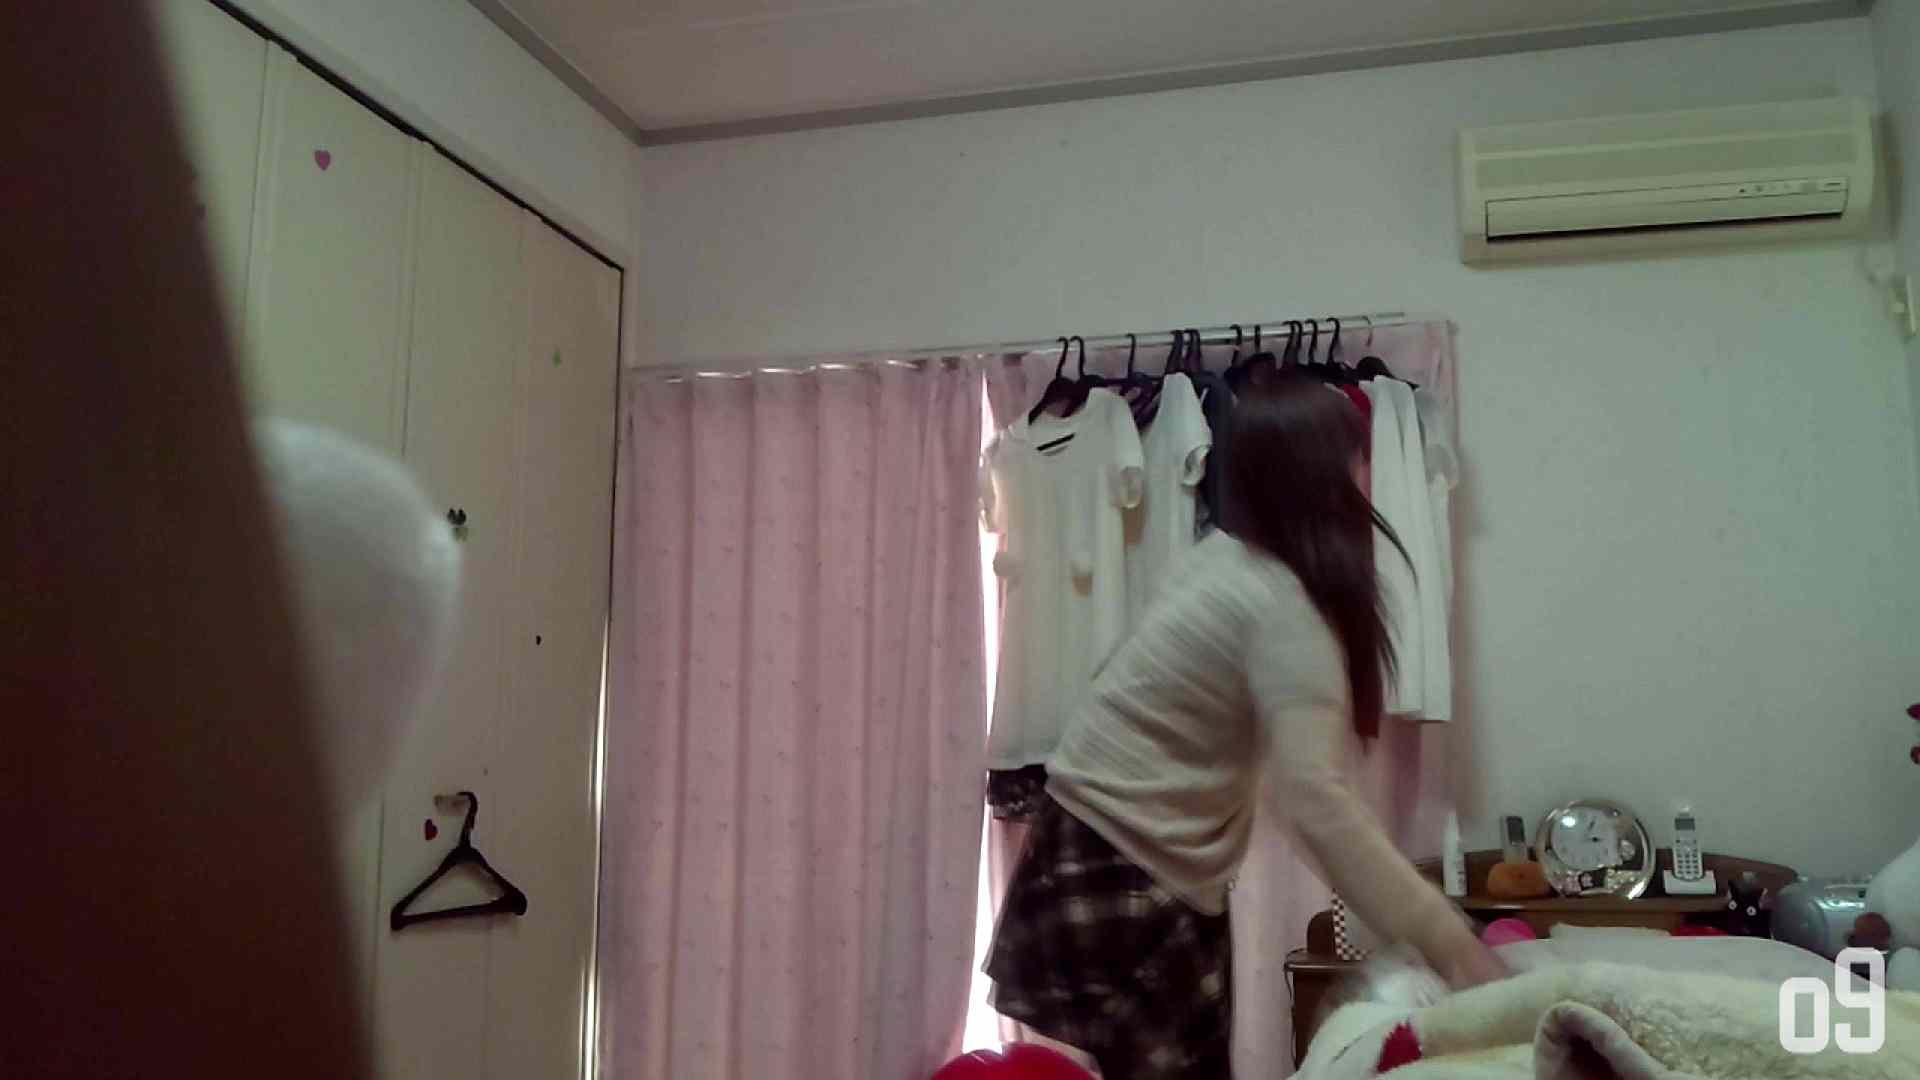 vol.2 瑞希ちゃんの自宅公開!寝起きの着替え・・・ラリルそー 美女OL | 着替え  44連発 41